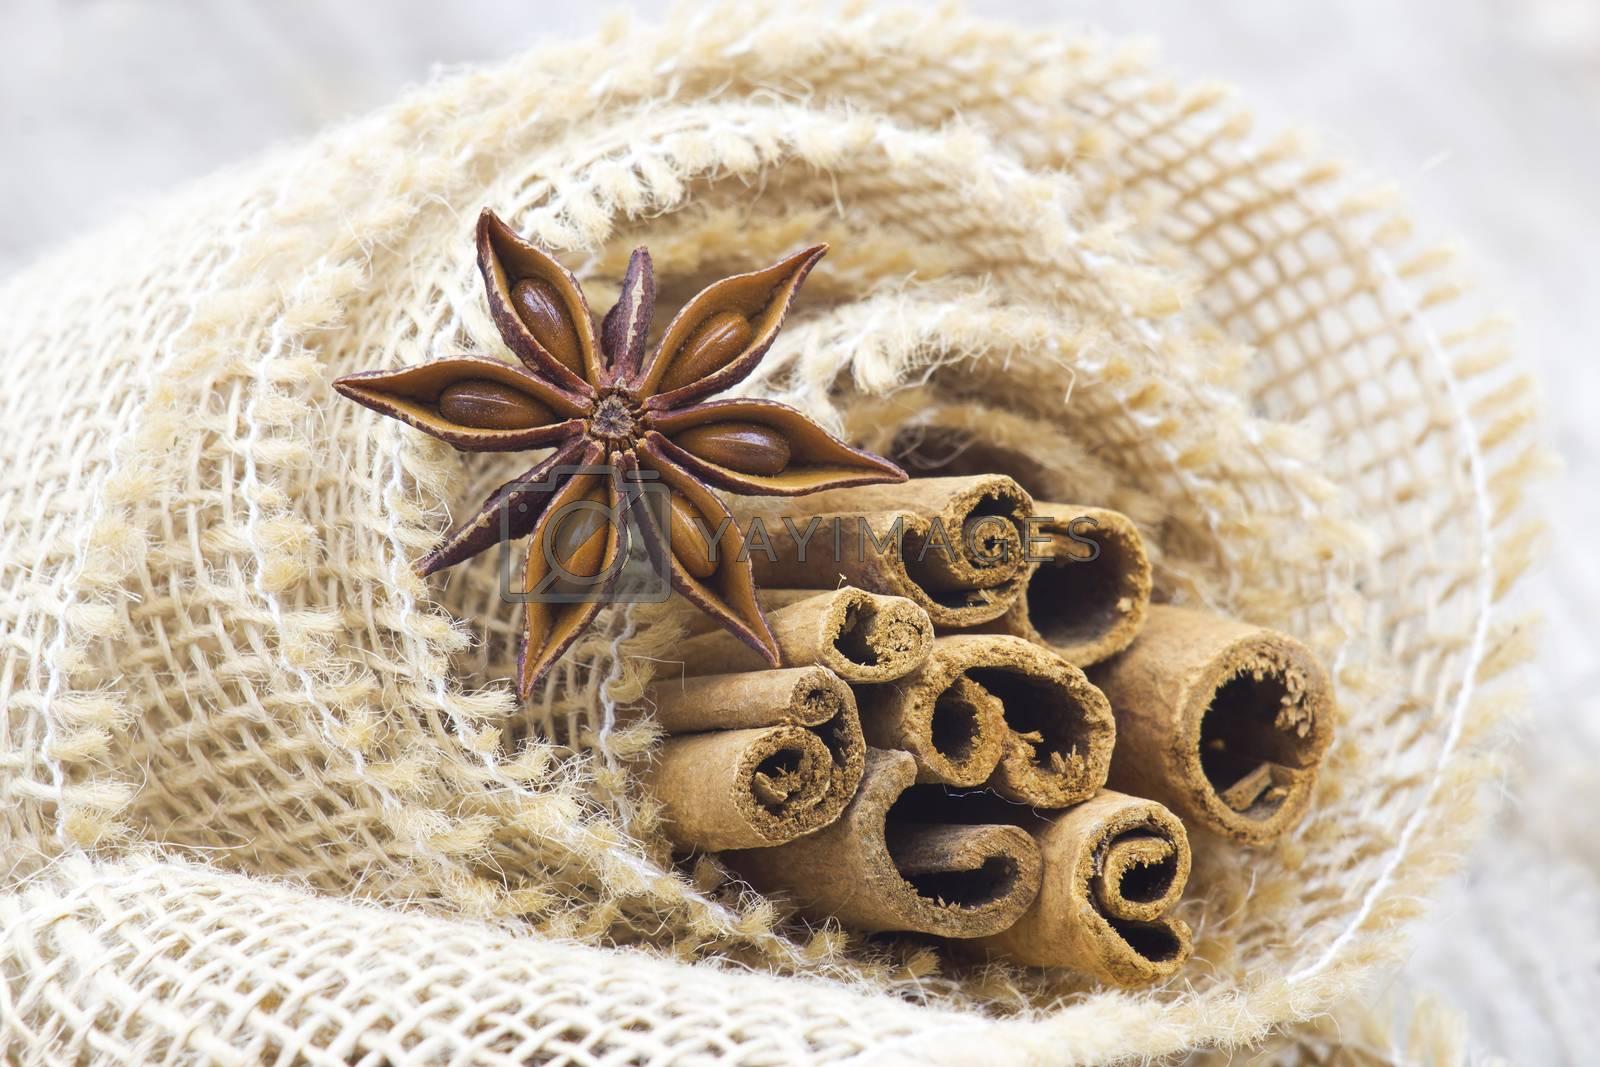 cinnamon sticks and anise